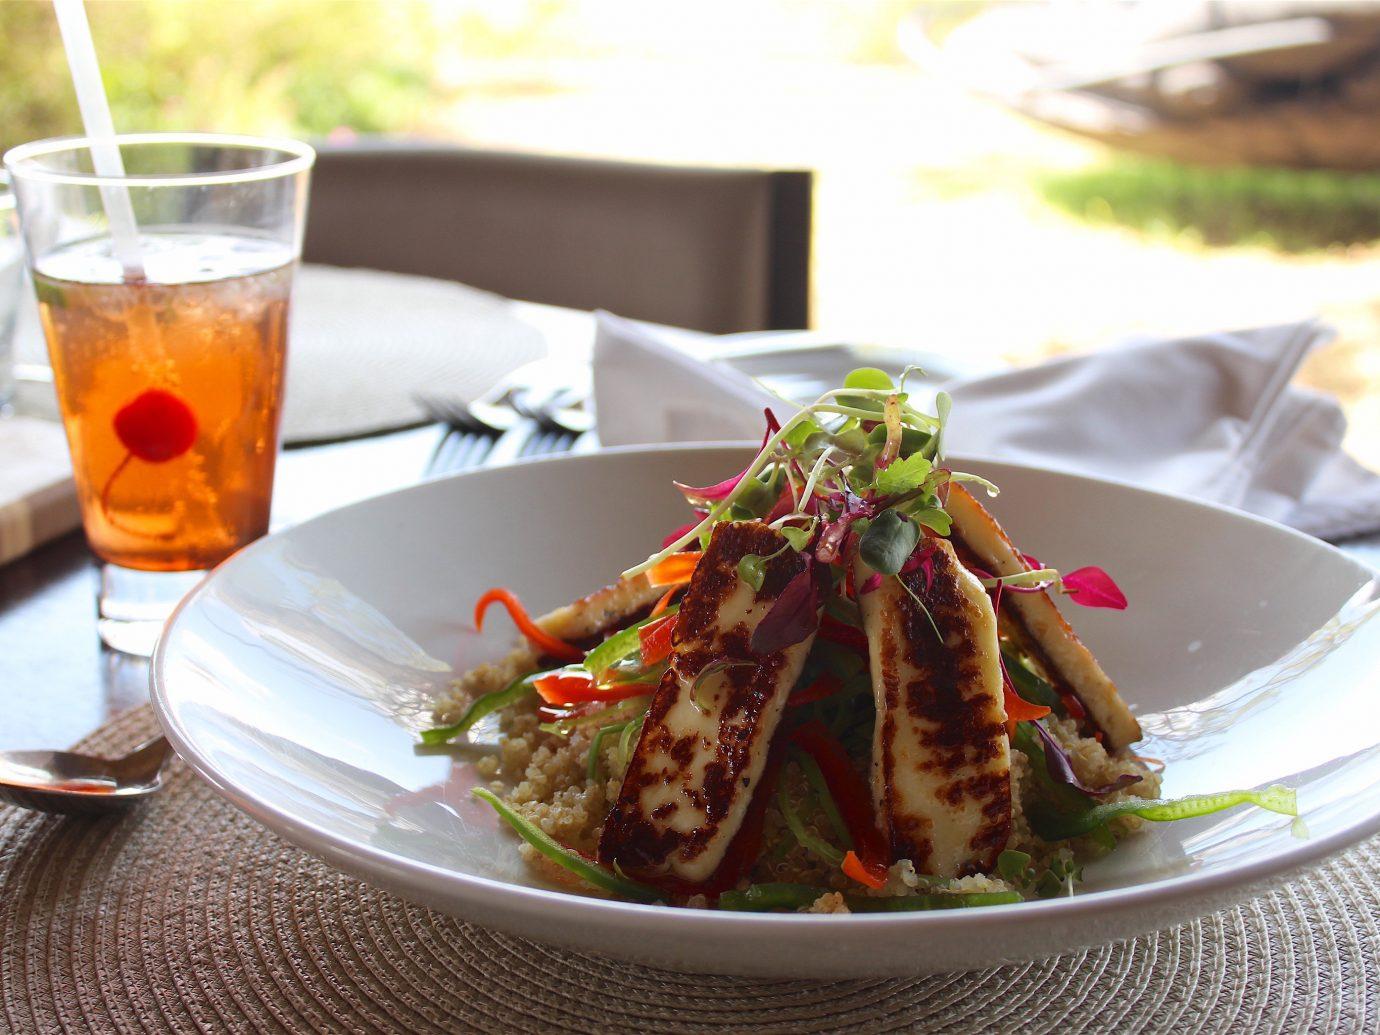 Outdoors + Adventure Safaris Trip Ideas table plate food dish cup arthropod restaurant meal cuisine Seafood Drink produce